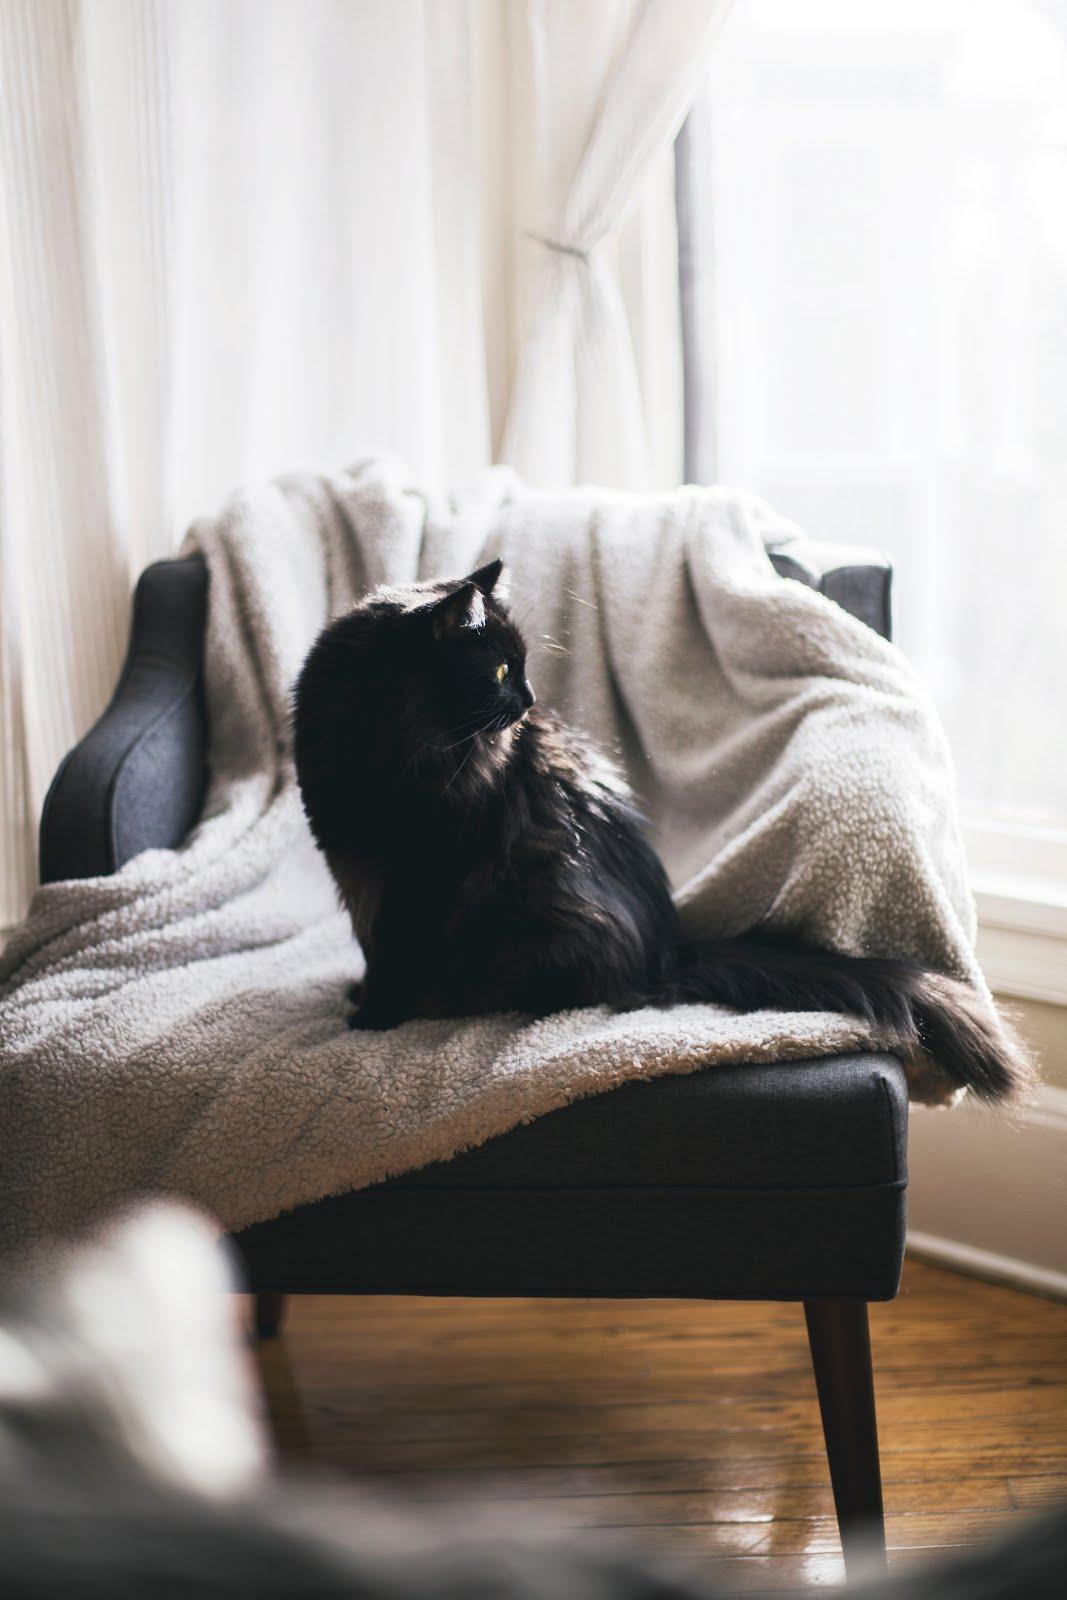 kari-shea cold blanket winter cozy hygge cat skincare dryness cold